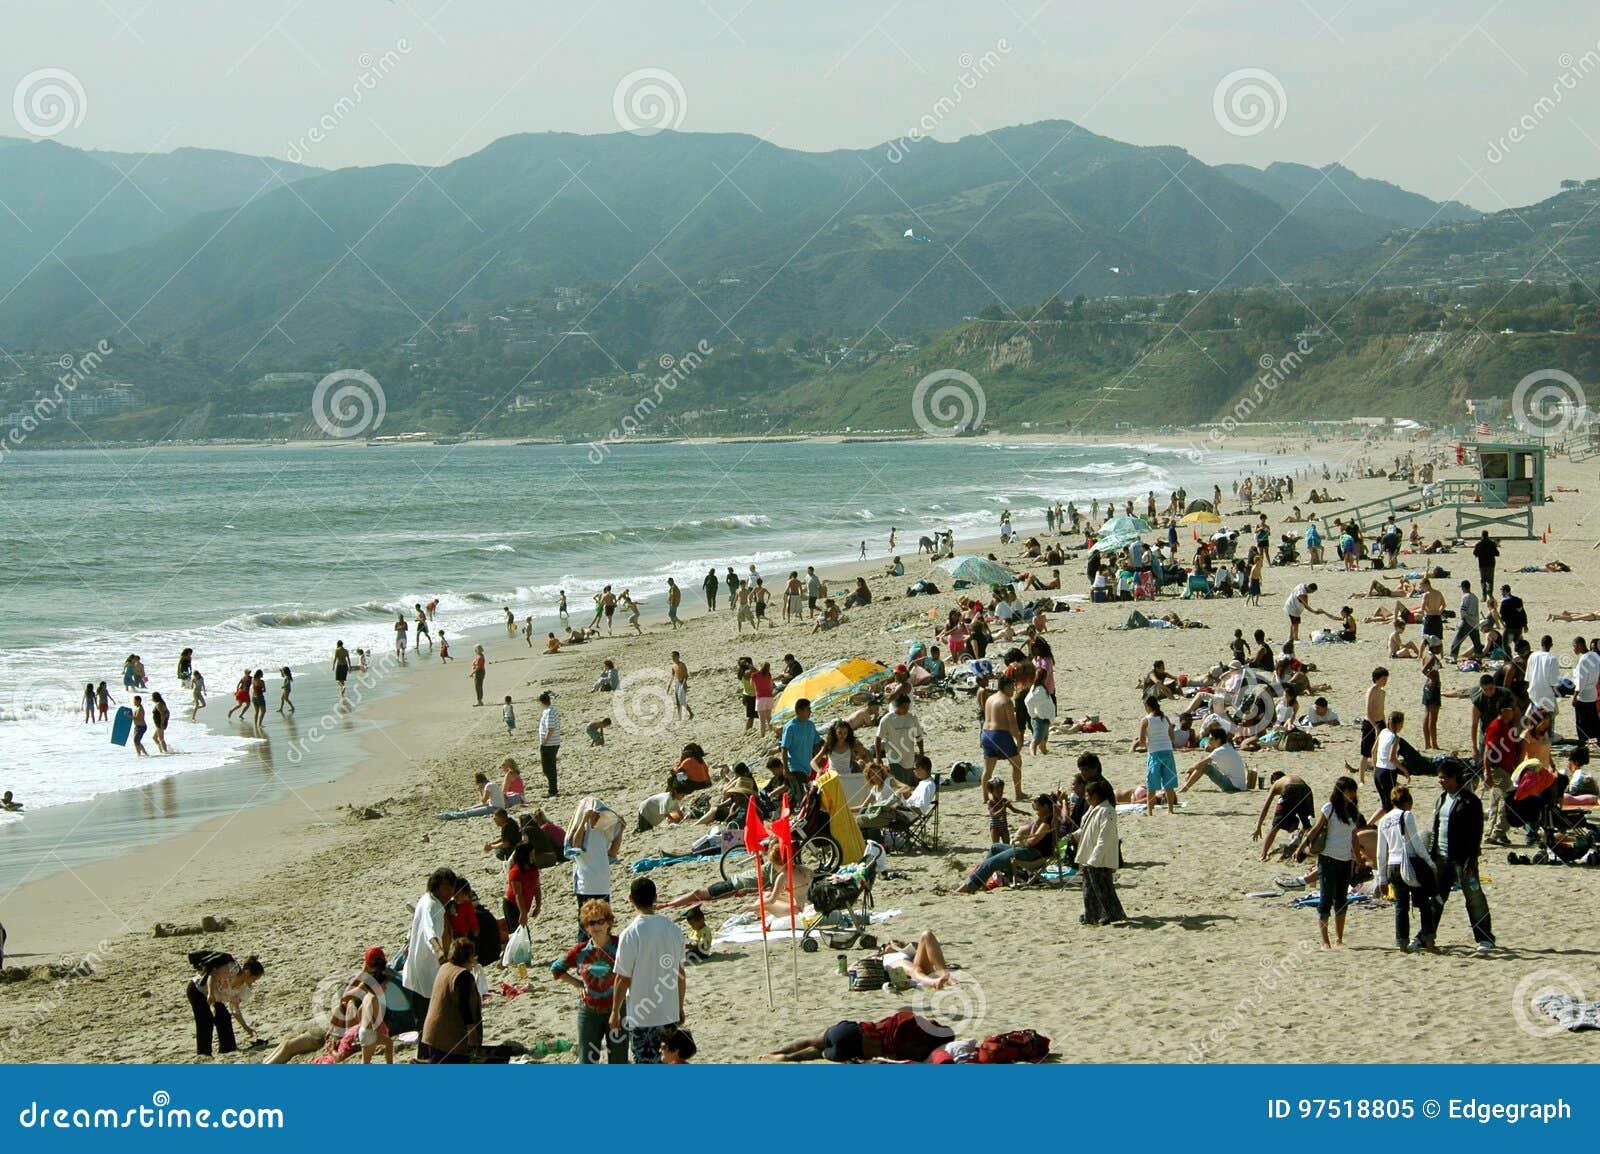 Picknick am Strand, Santa Monica Beach, Kalifornien, USA